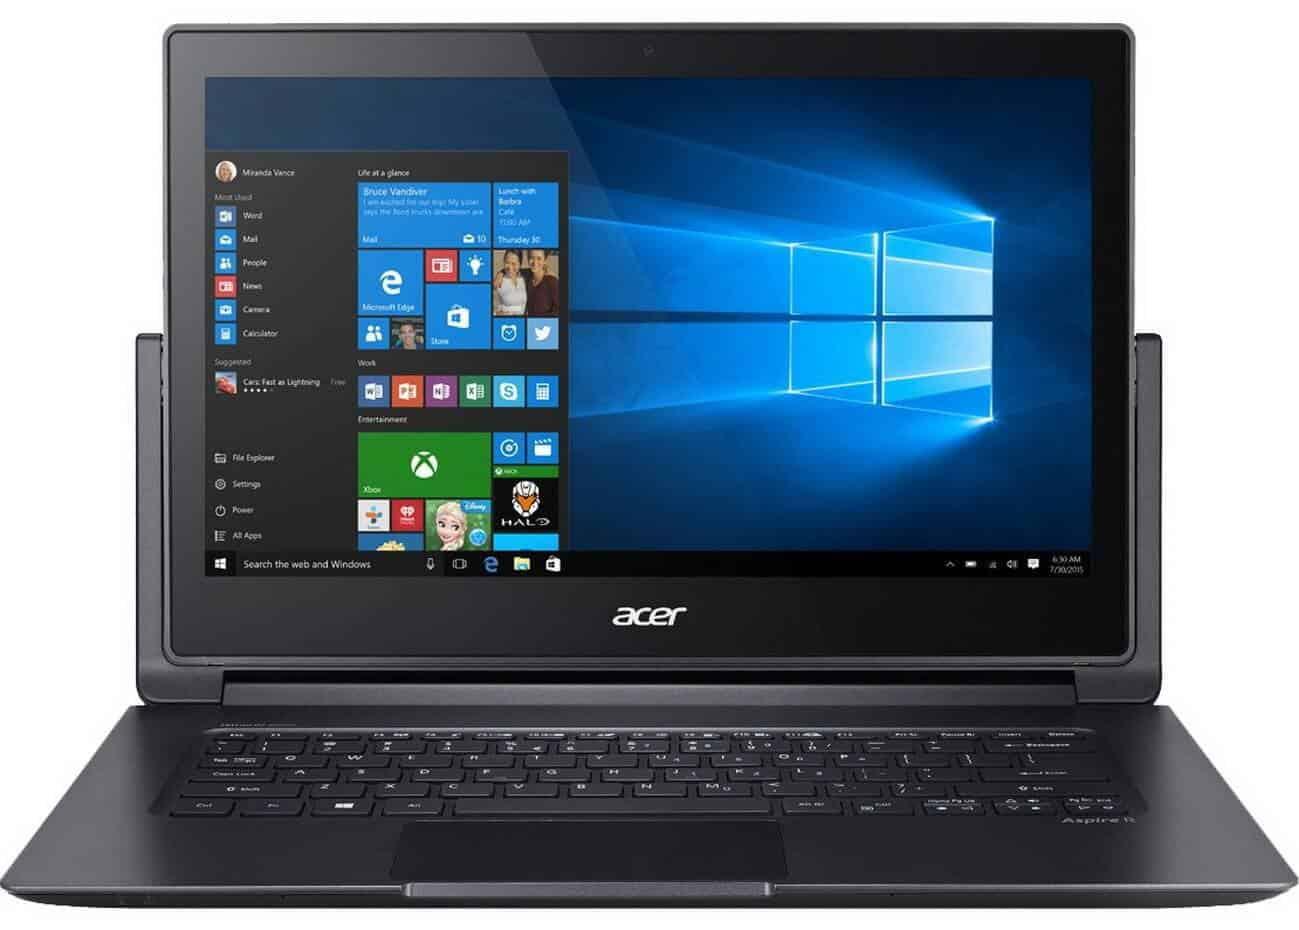 Acer Aspire R7-372T-743X